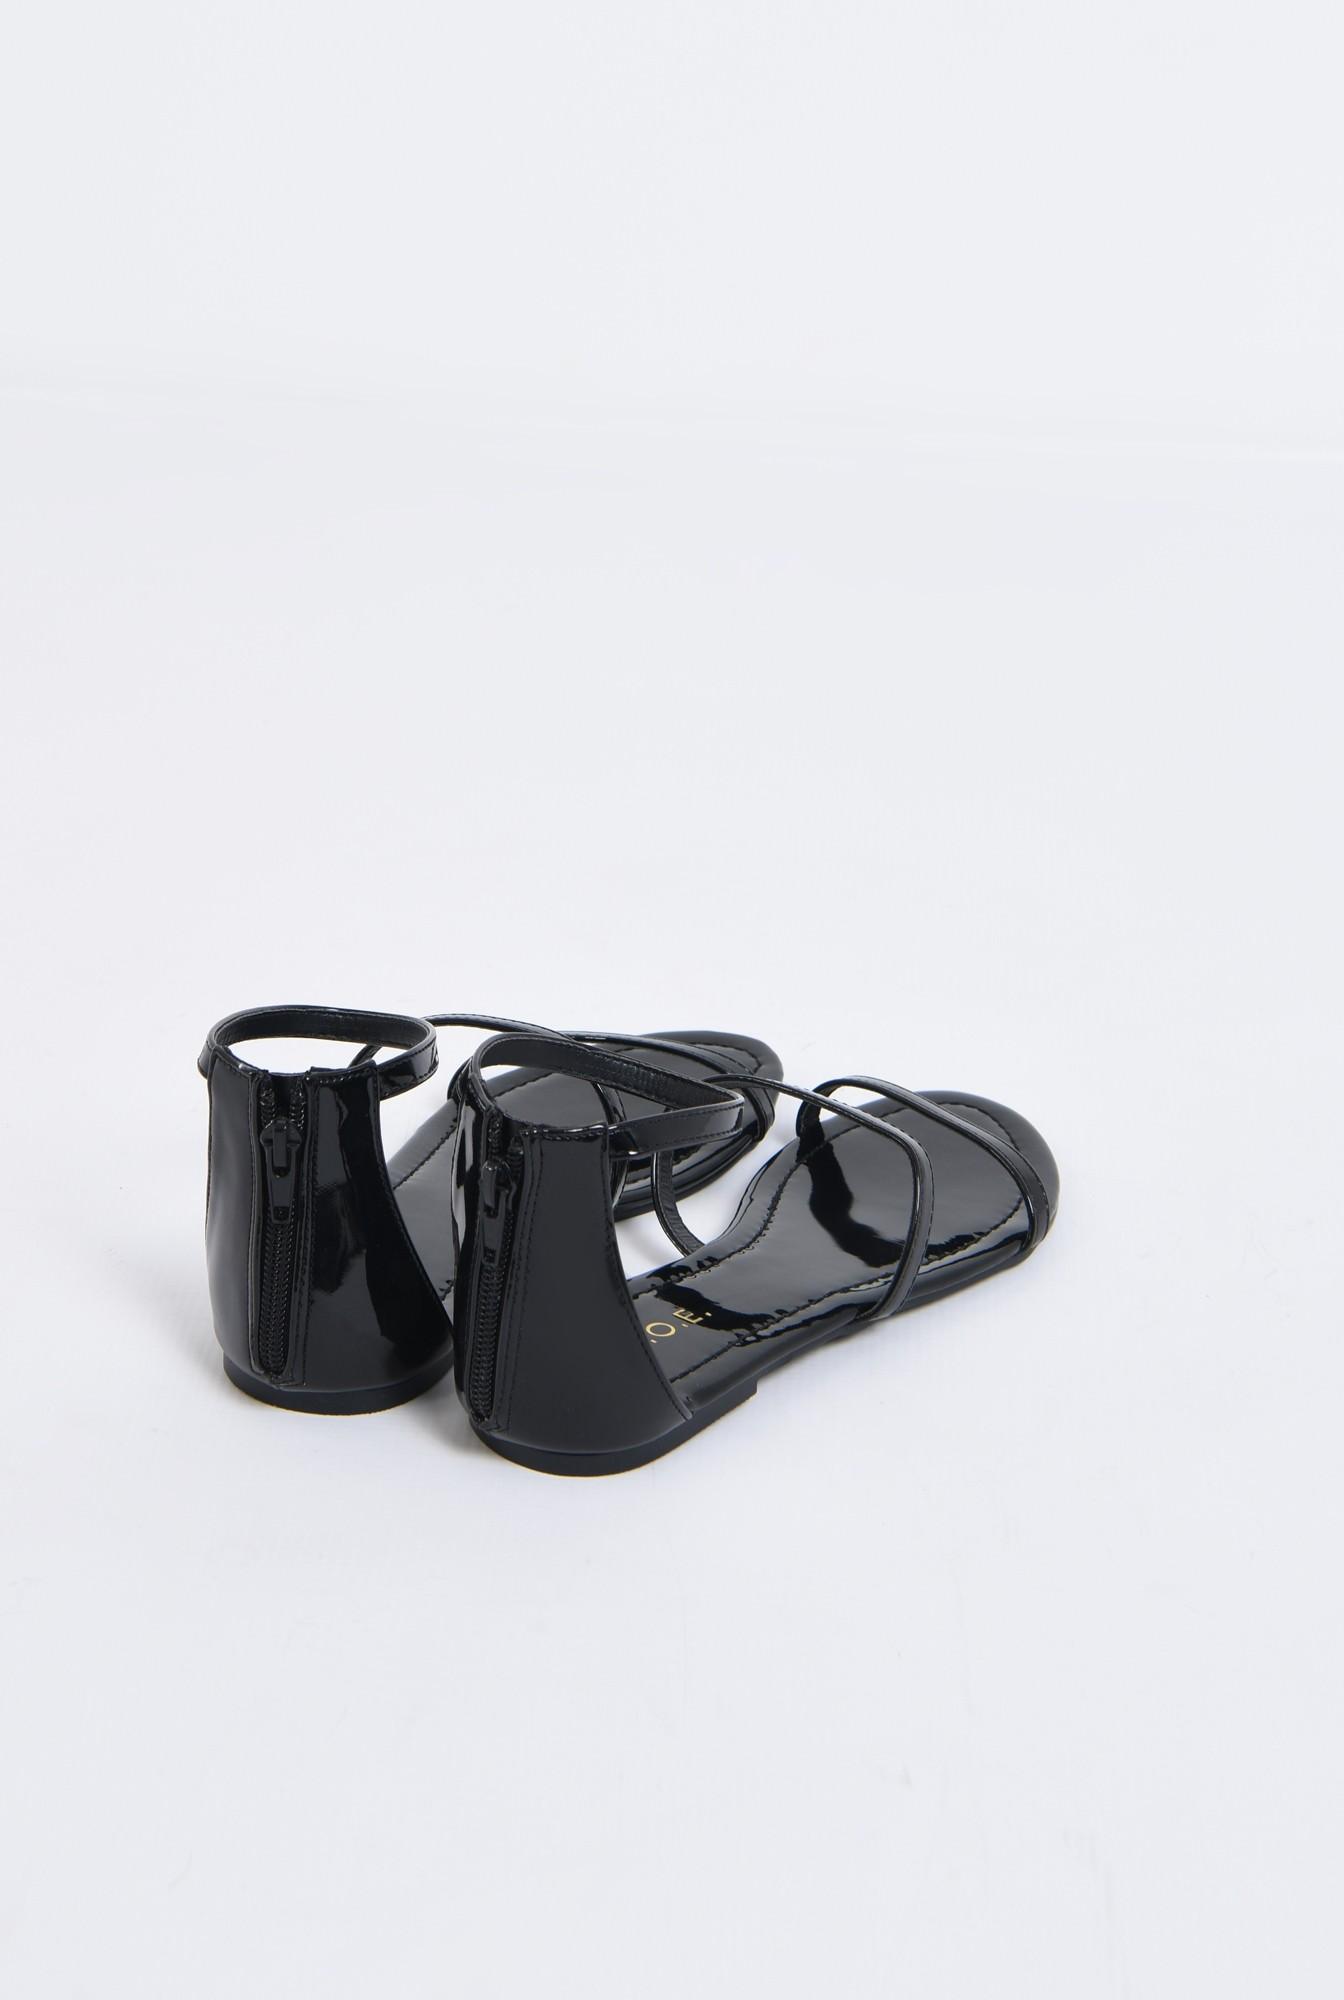 2 - sandale casual, cu talpa joasa, barete subtiri